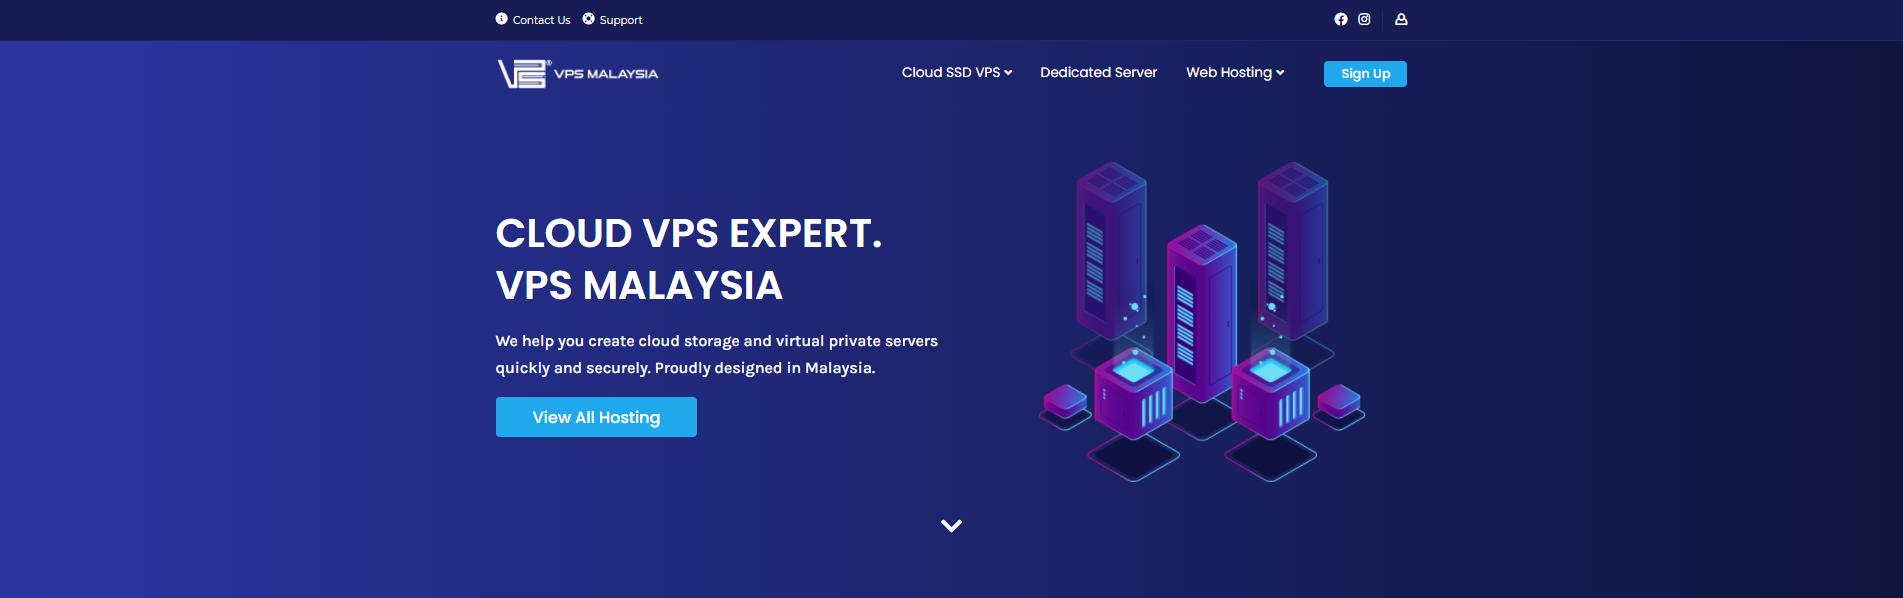 VPS Malaysia banner